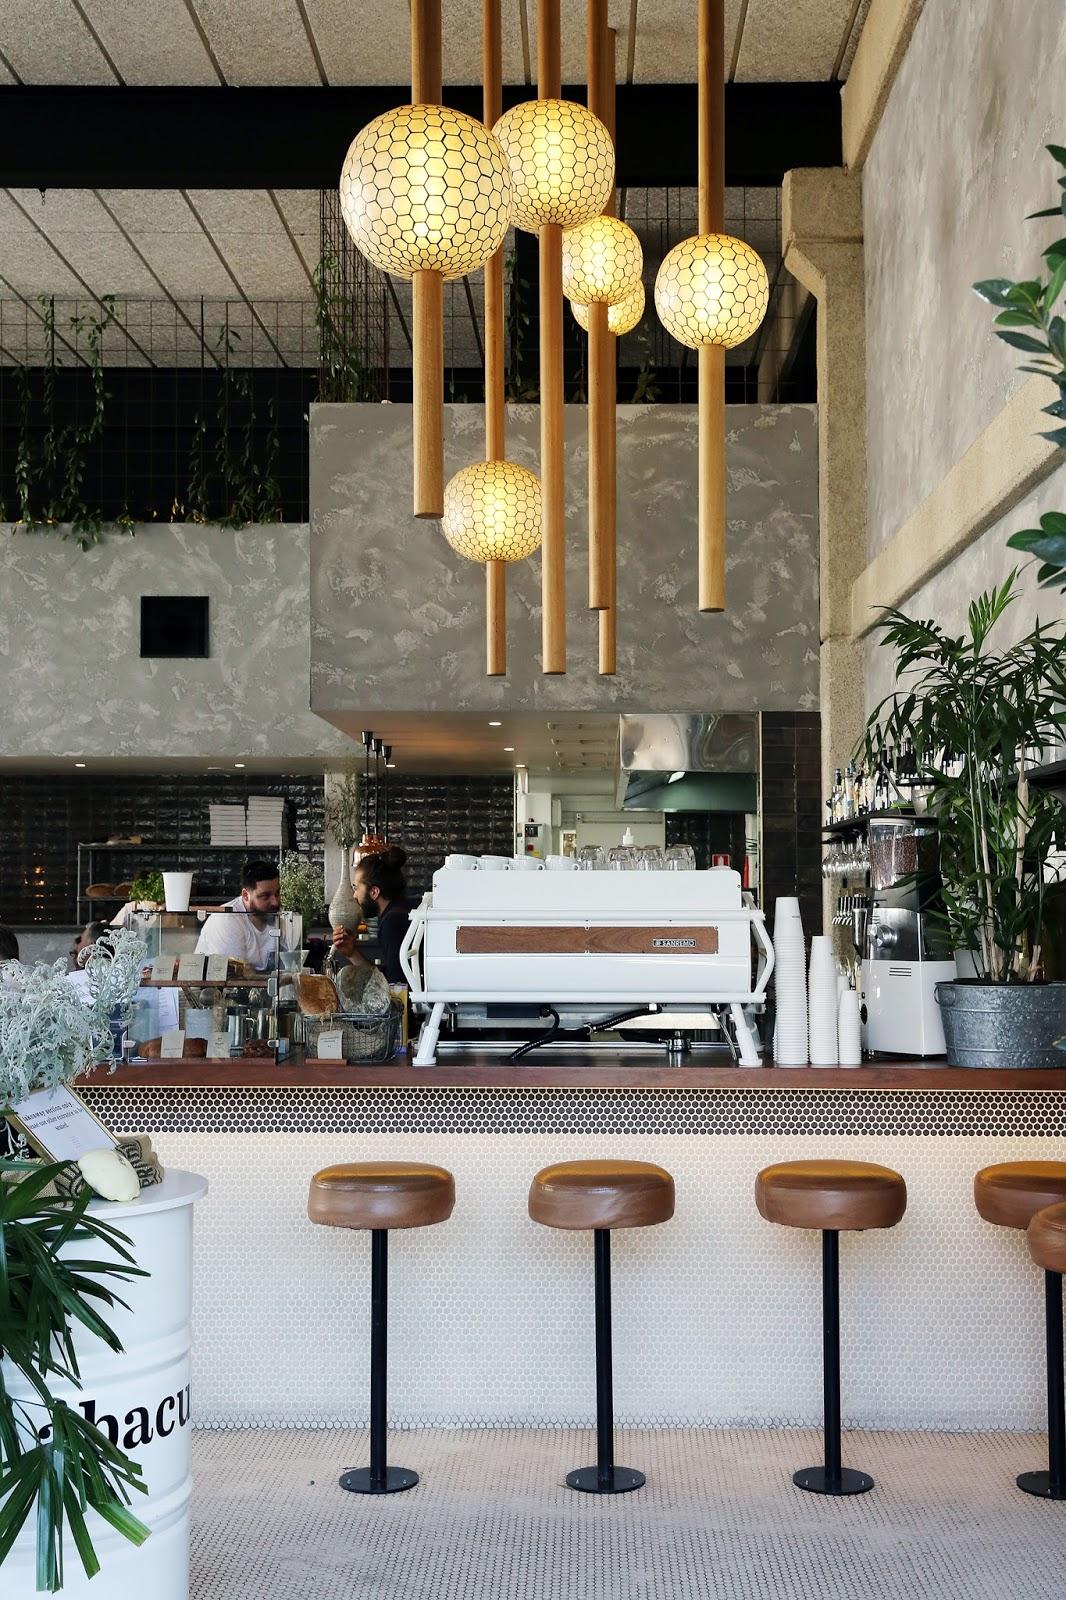 Melbourne, Australia: 8 of my Favourite Brunch Spots